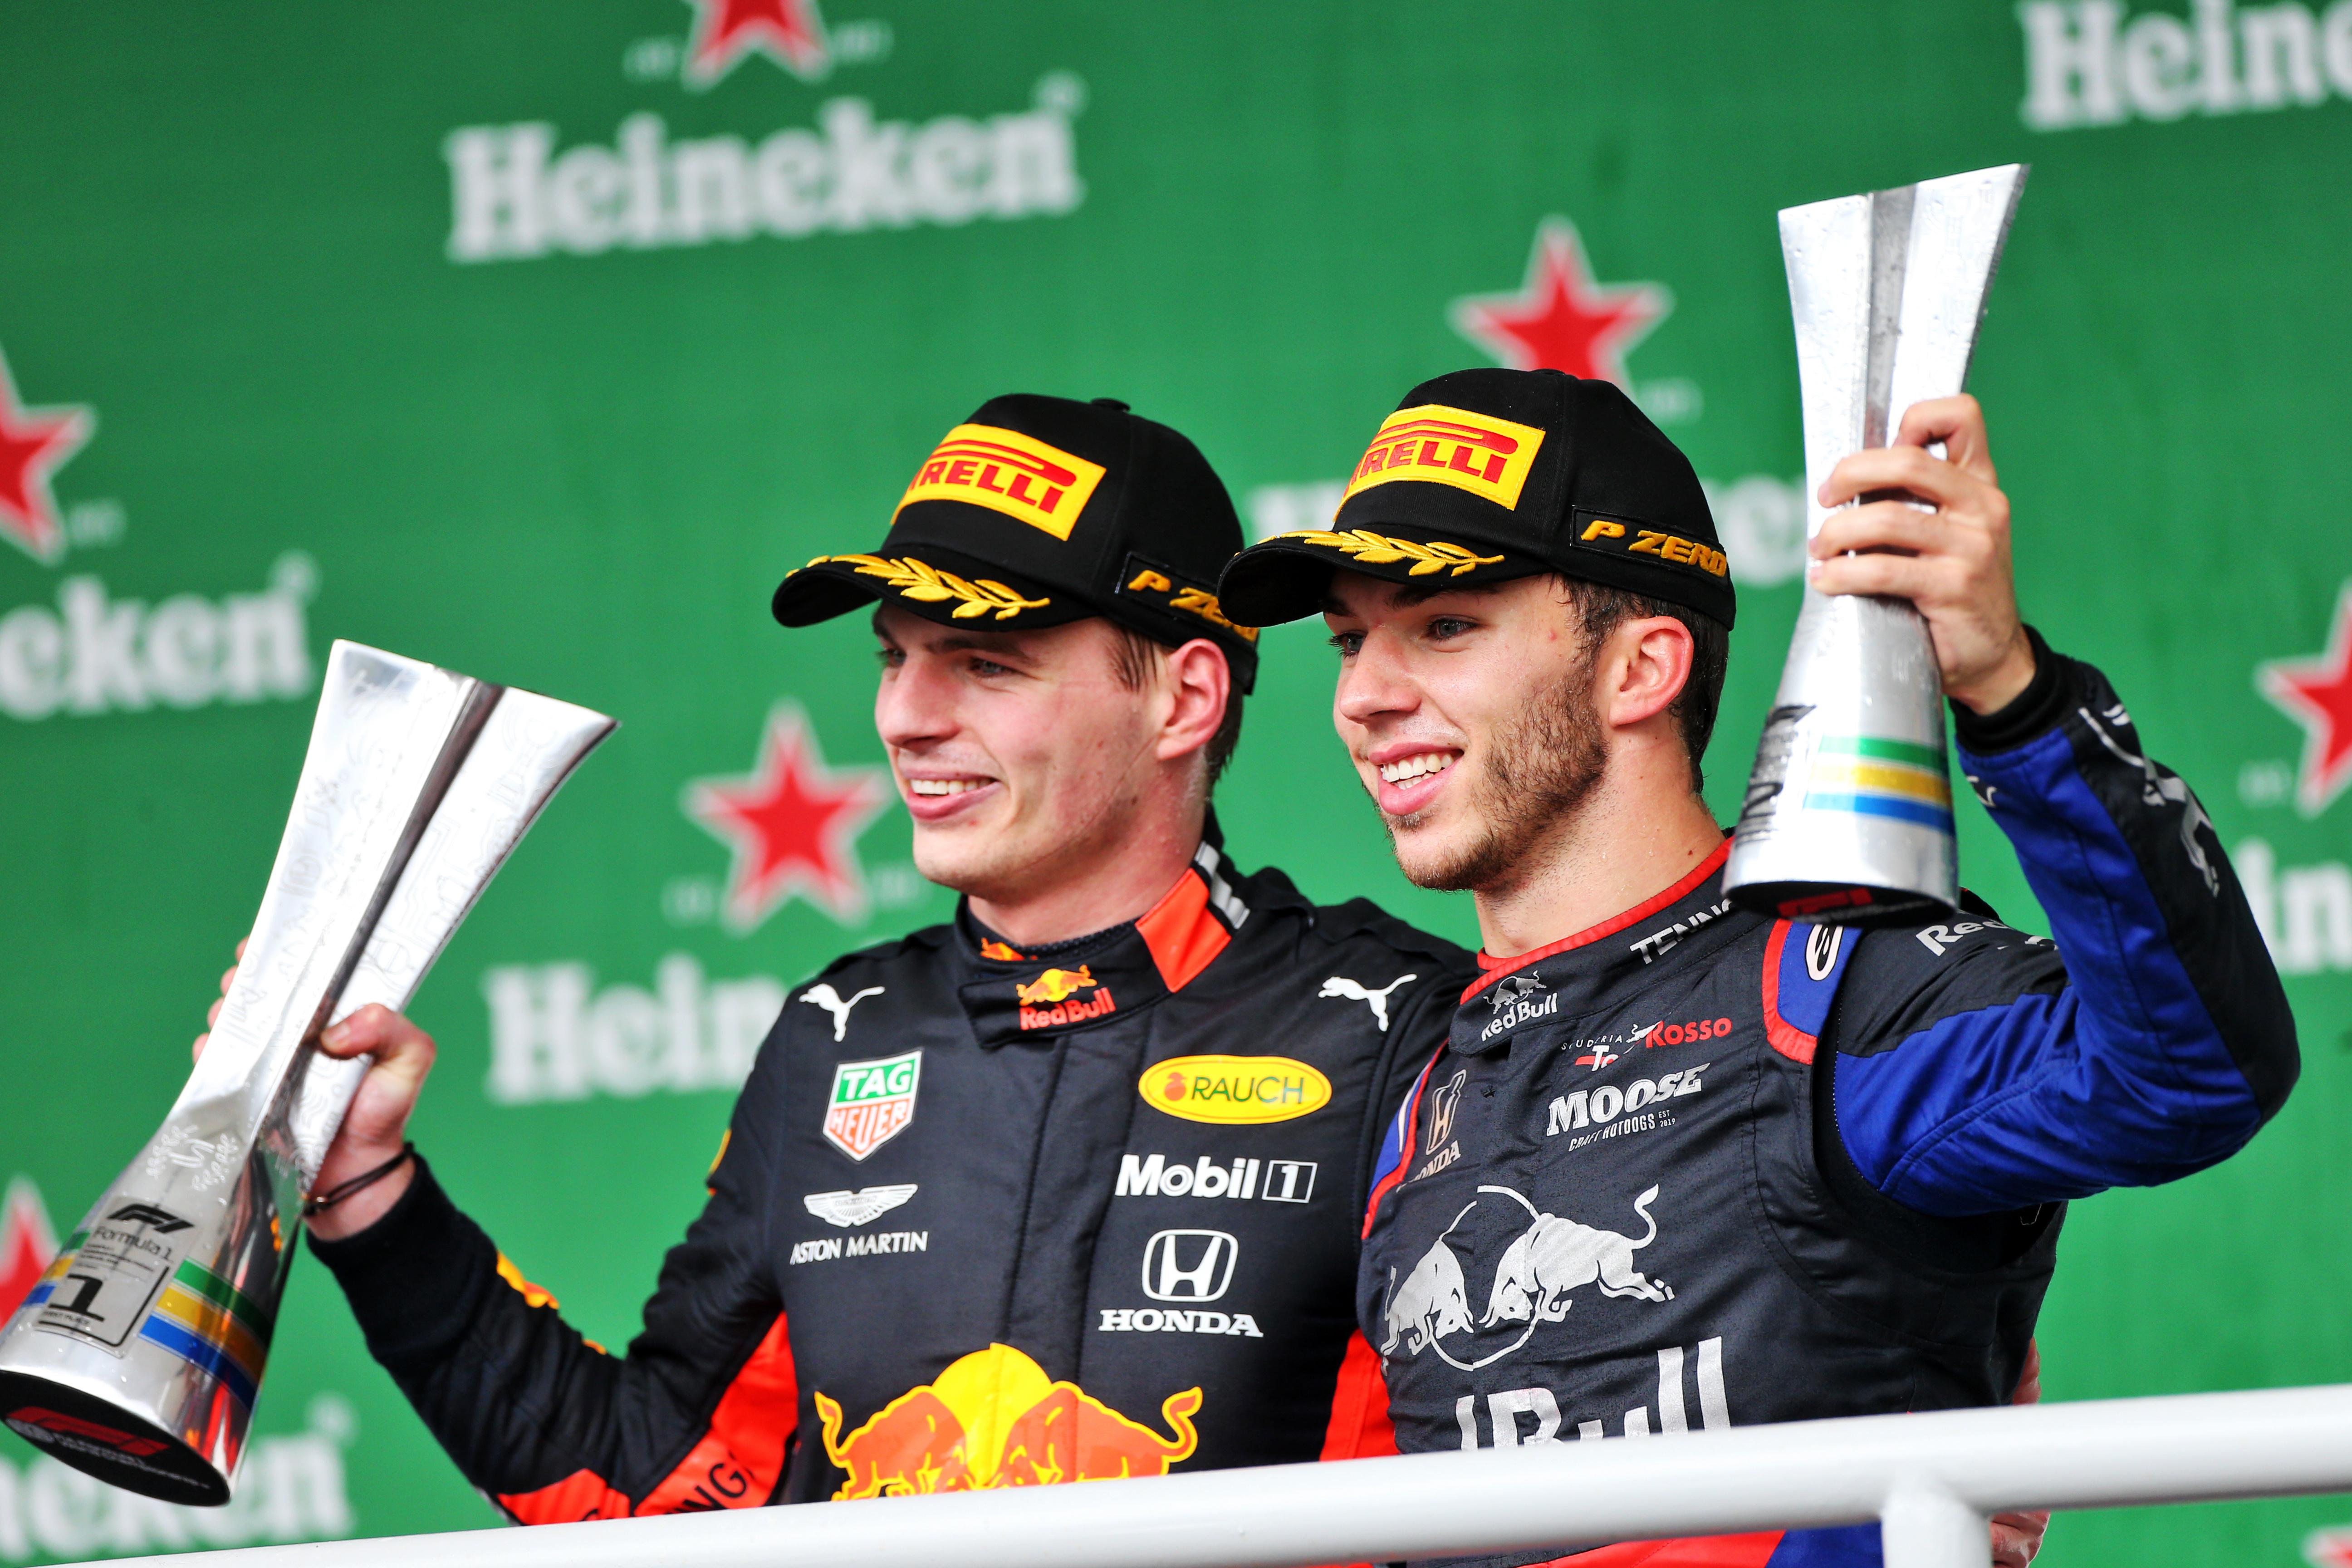 Pierre Gasly AlphaTauri Max Verstappen Red Bull F1 2019